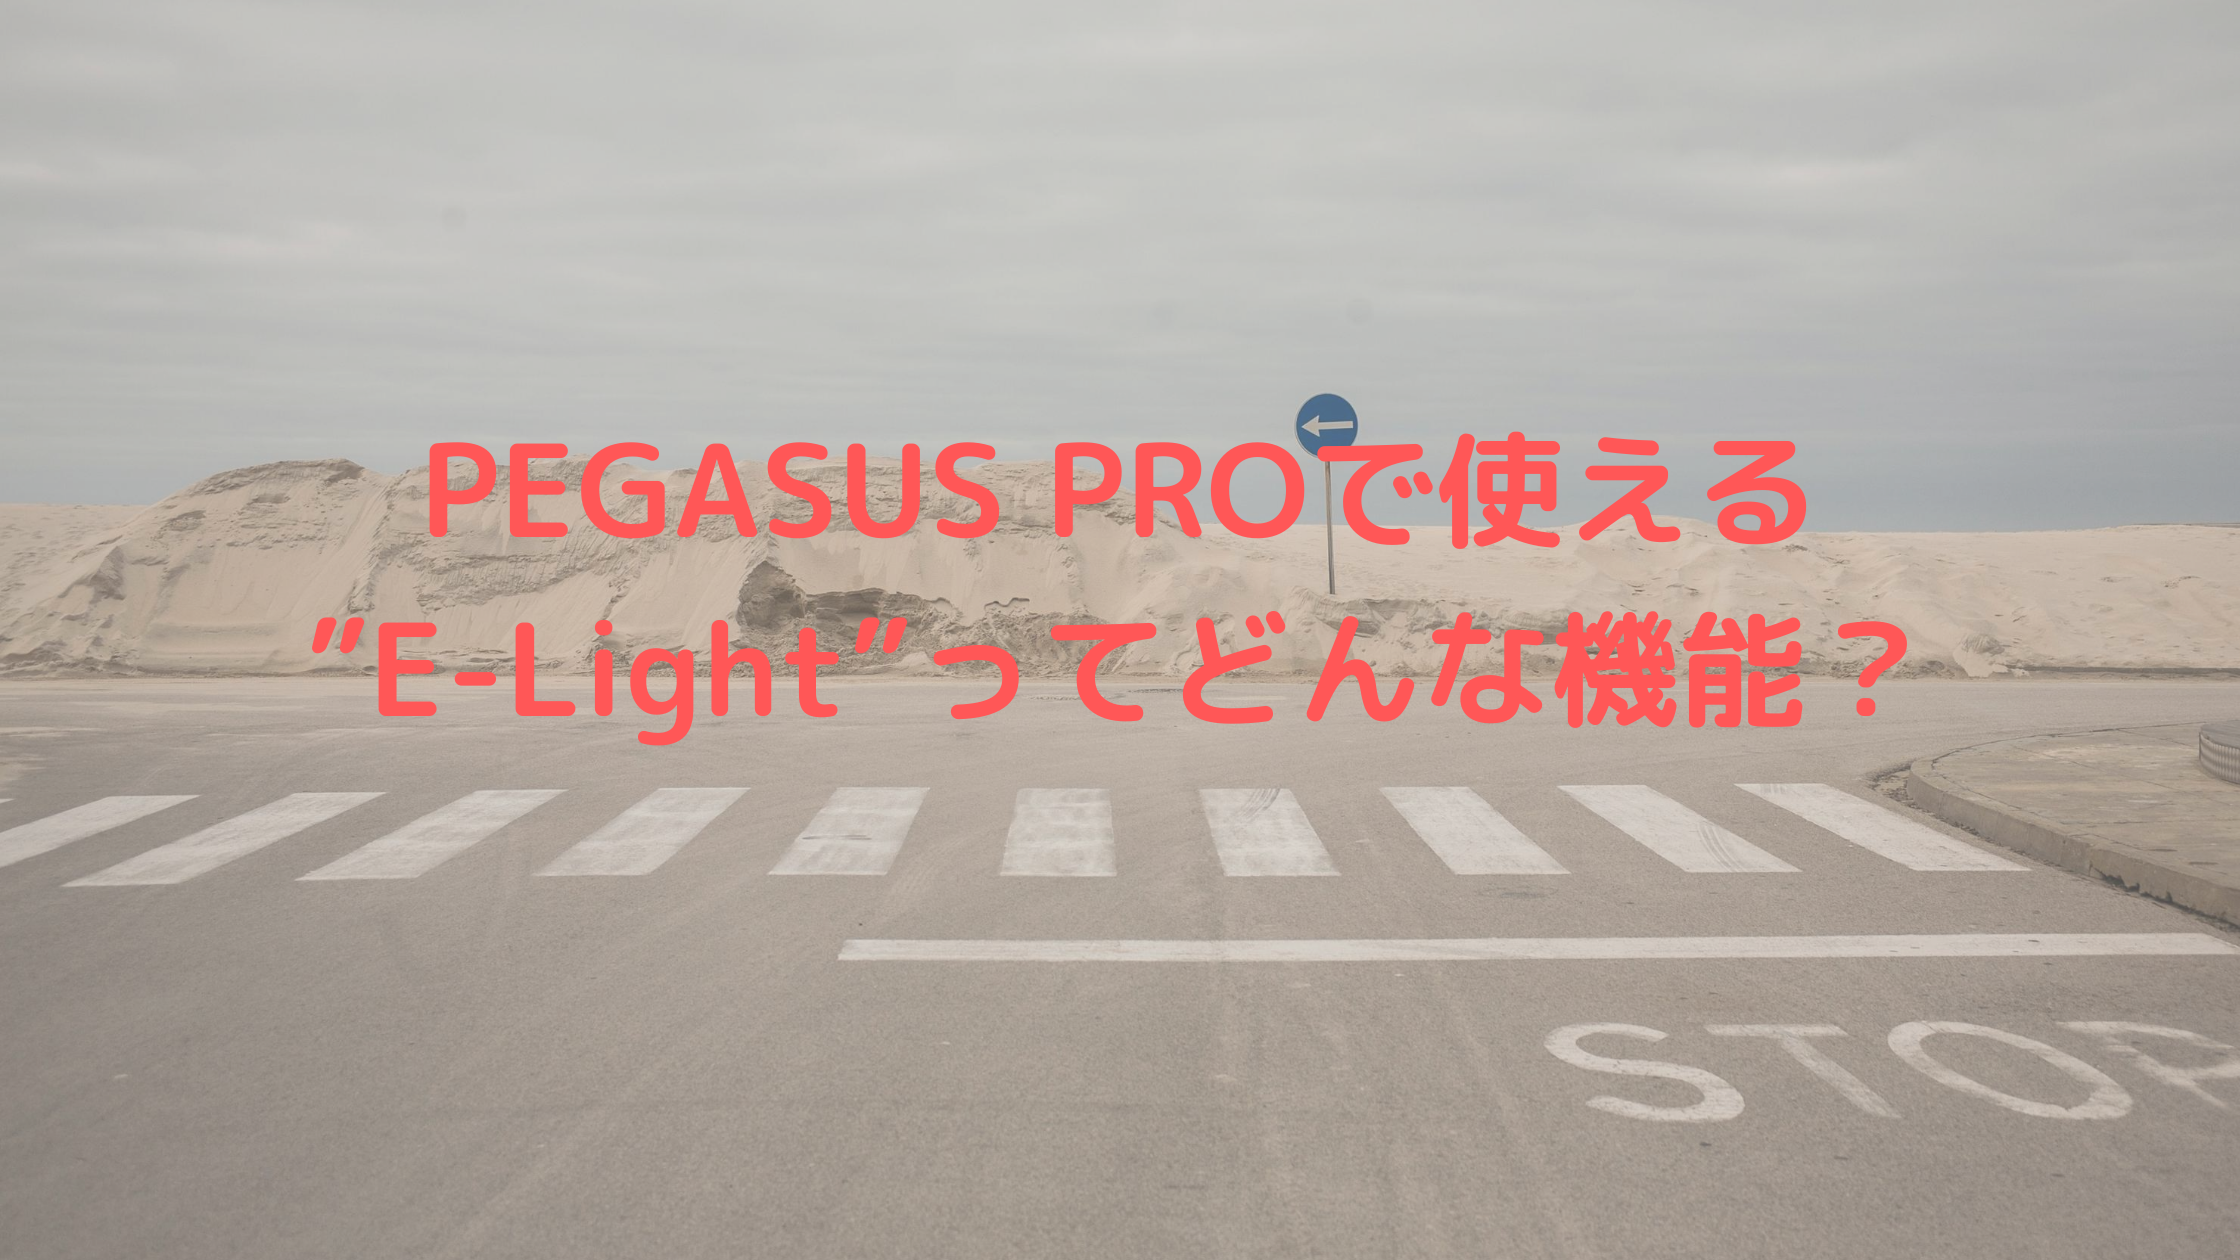 "PEGASUS PROで使える""E-Light""ってどんな機能?"